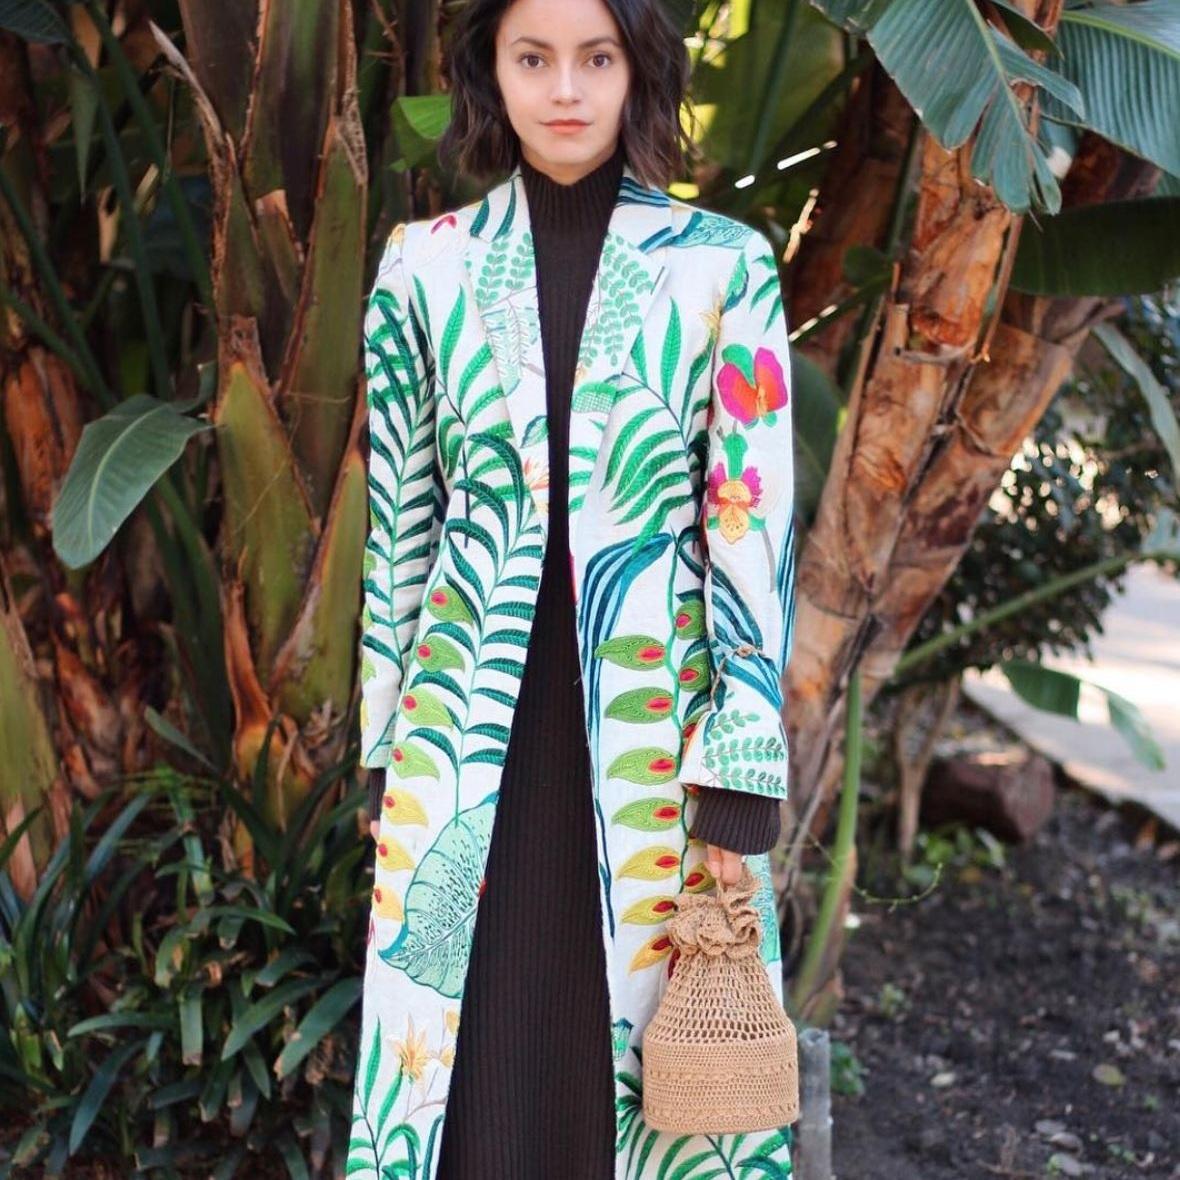 KATRINA RAZON - Heliconias Kimono  #almagirl #girlboss  @Los Angeles